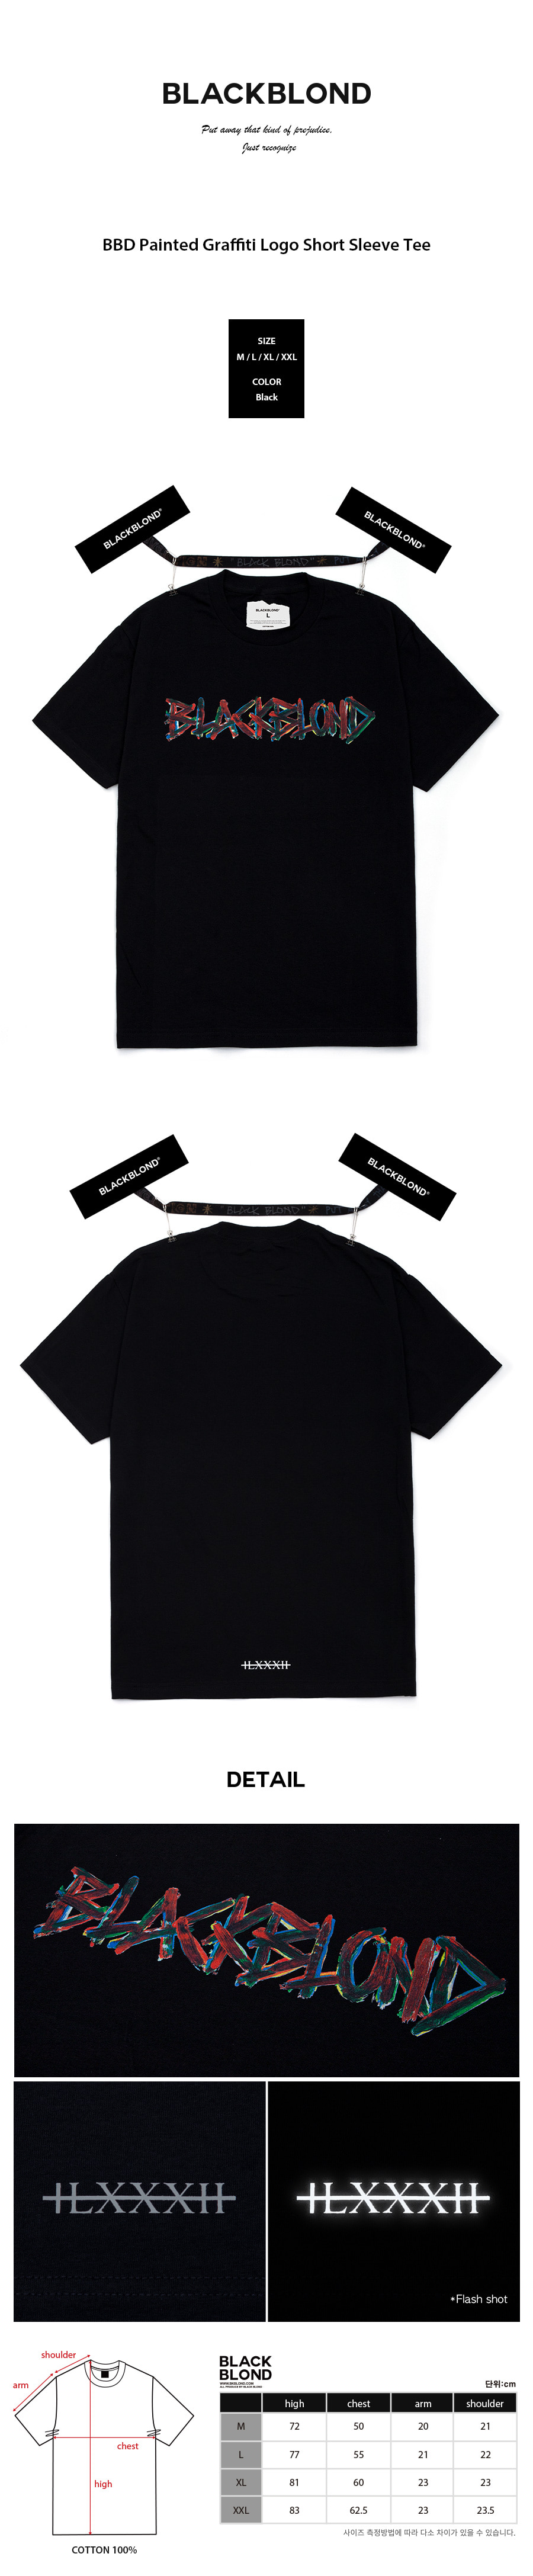 BLACKBLOND - BBD Painted Graffiti Logo Short Sleeve Tee (Black)